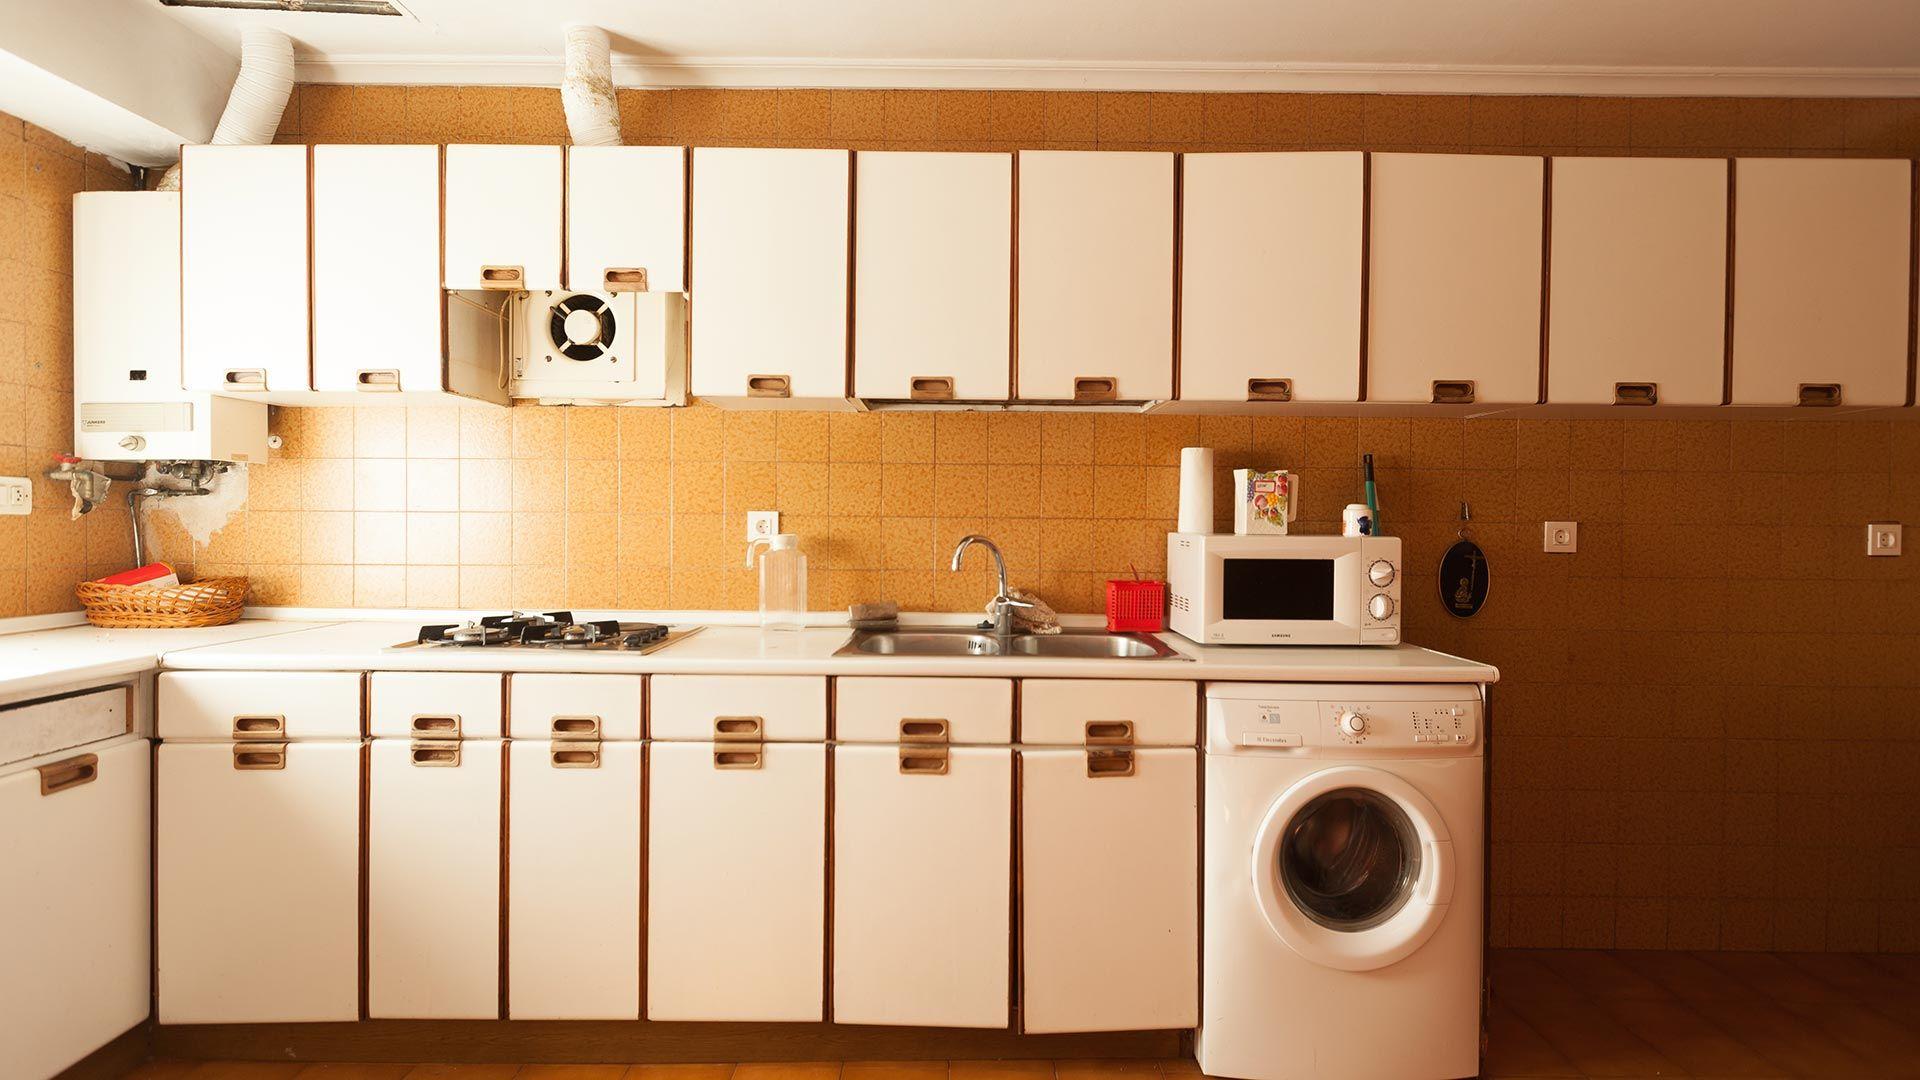 Decorar cocina amplia sin obra - antes